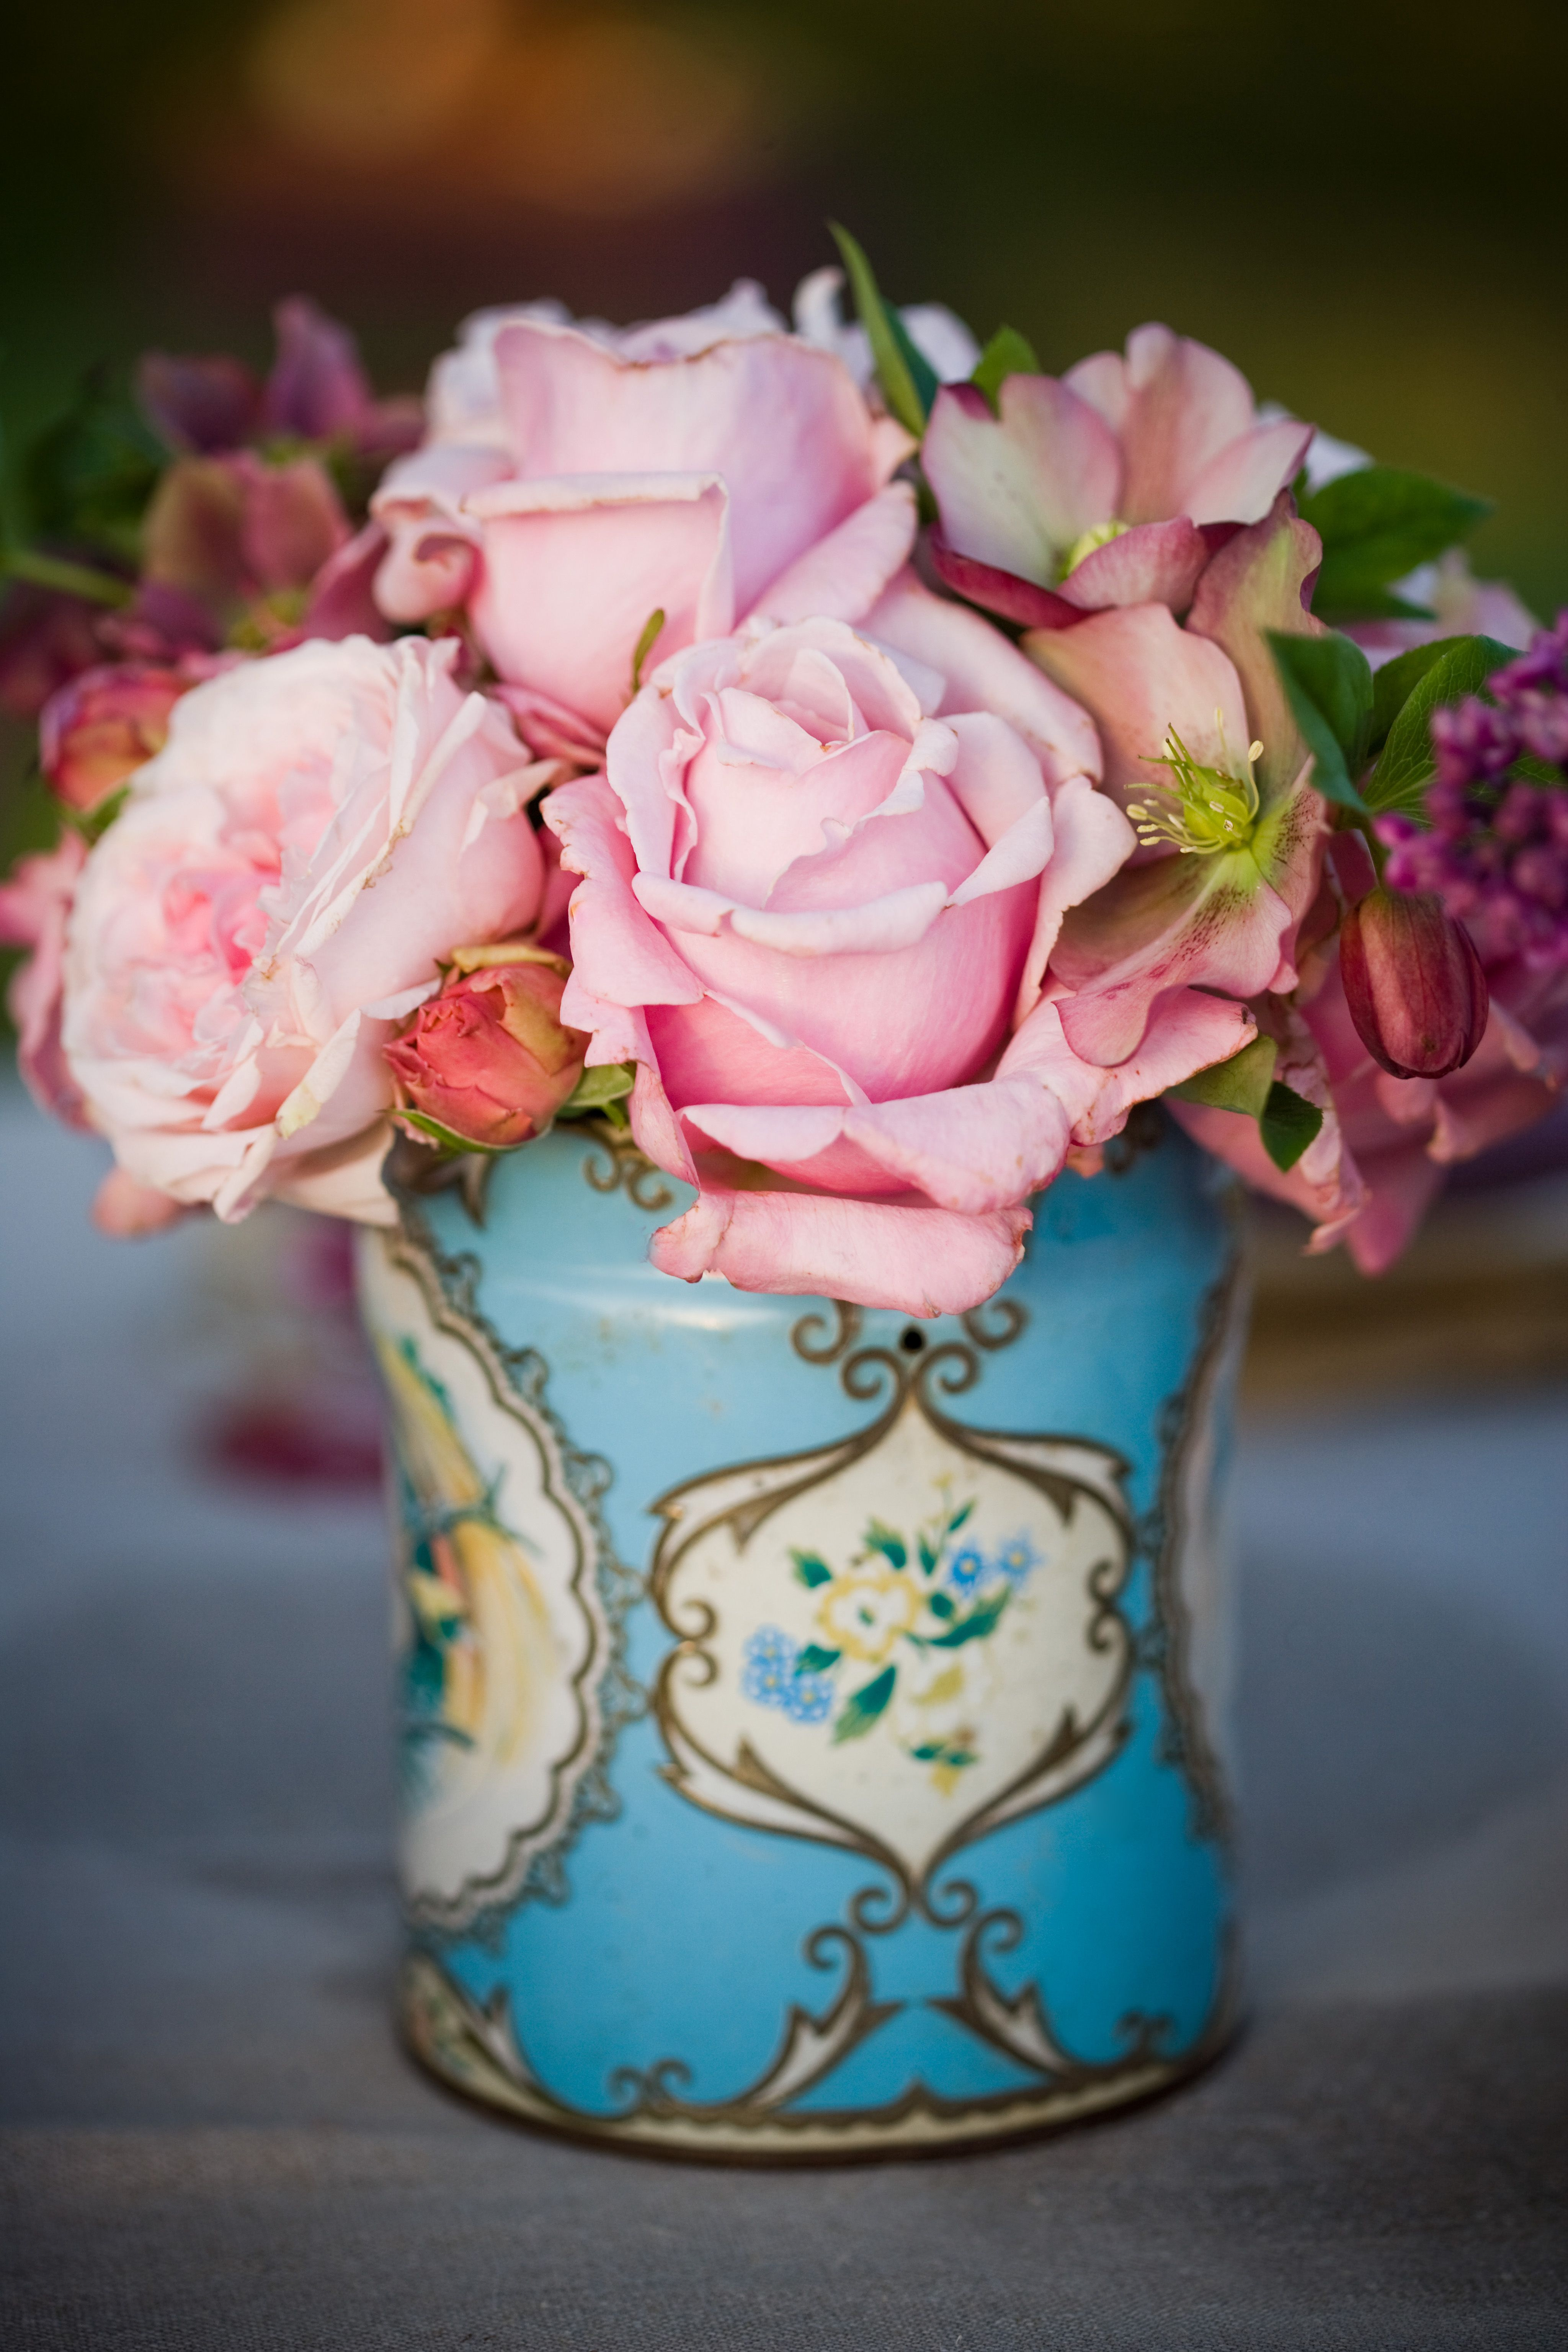 Roses in vintage tin rose roses flowers get wowed with an amazing roses in vintage tin rose roses flowers get wowed with an amazing bouquet izmirmasajfo